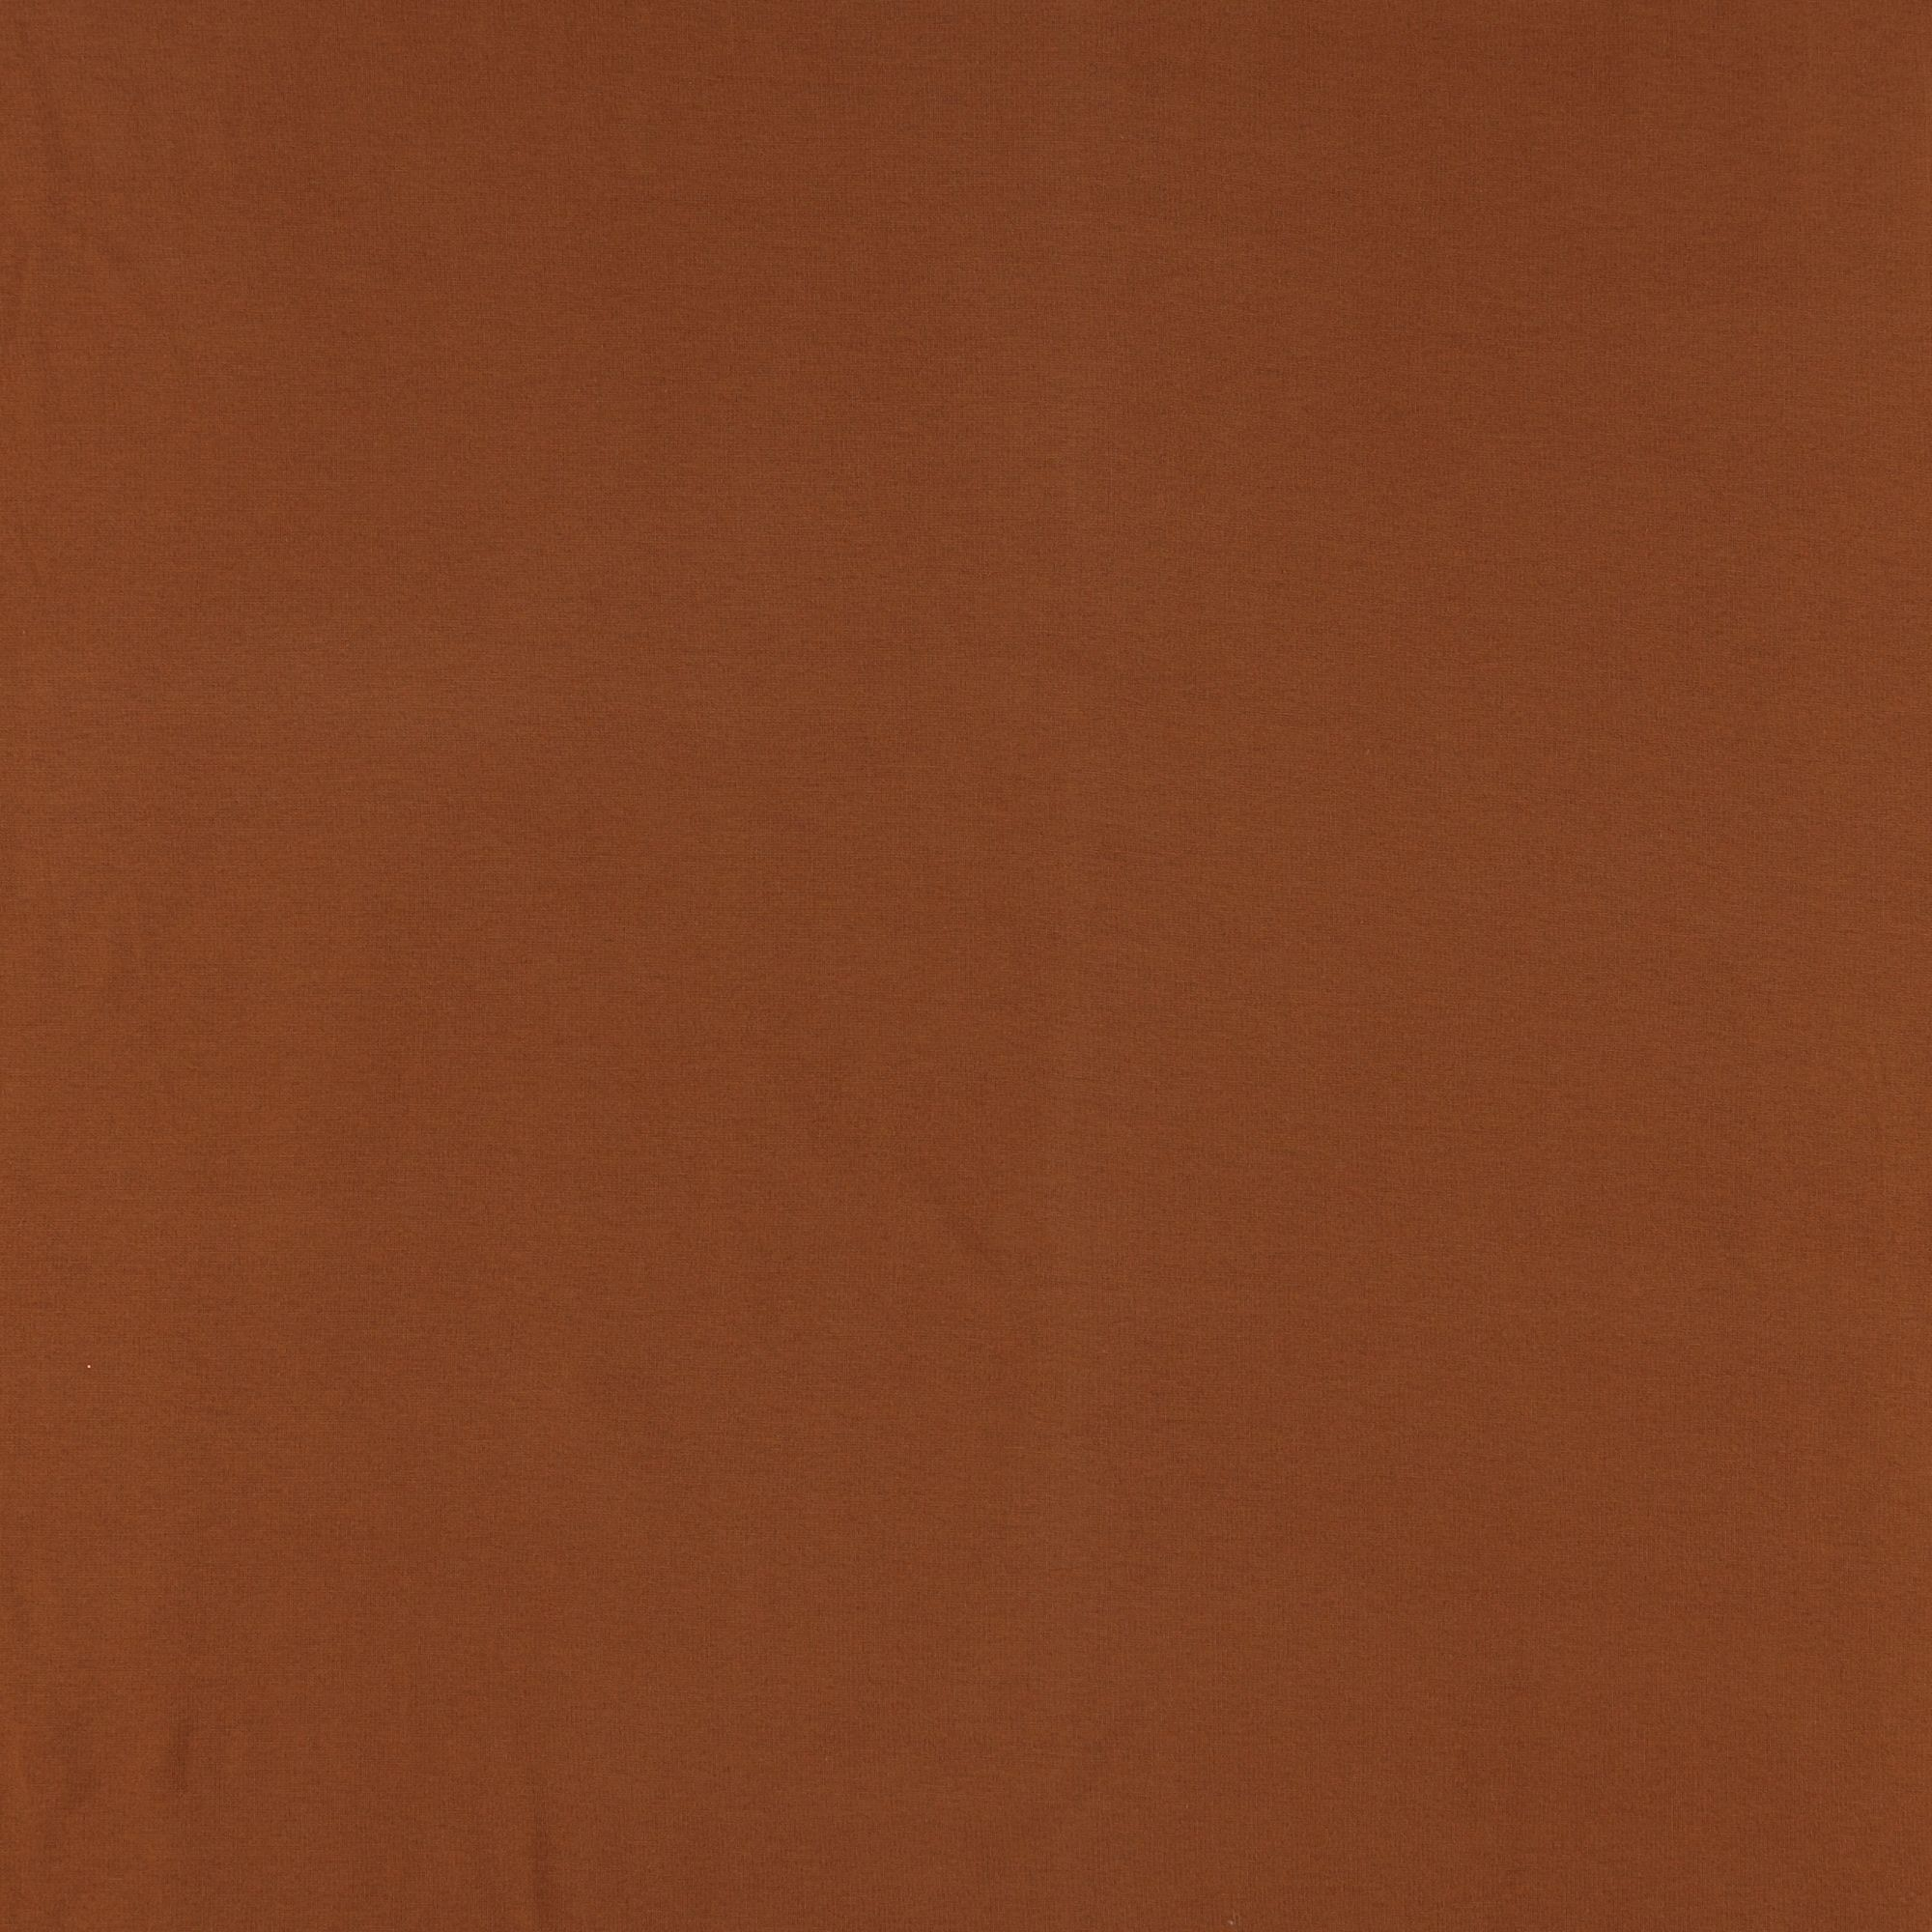 Gyllenbrun, eko